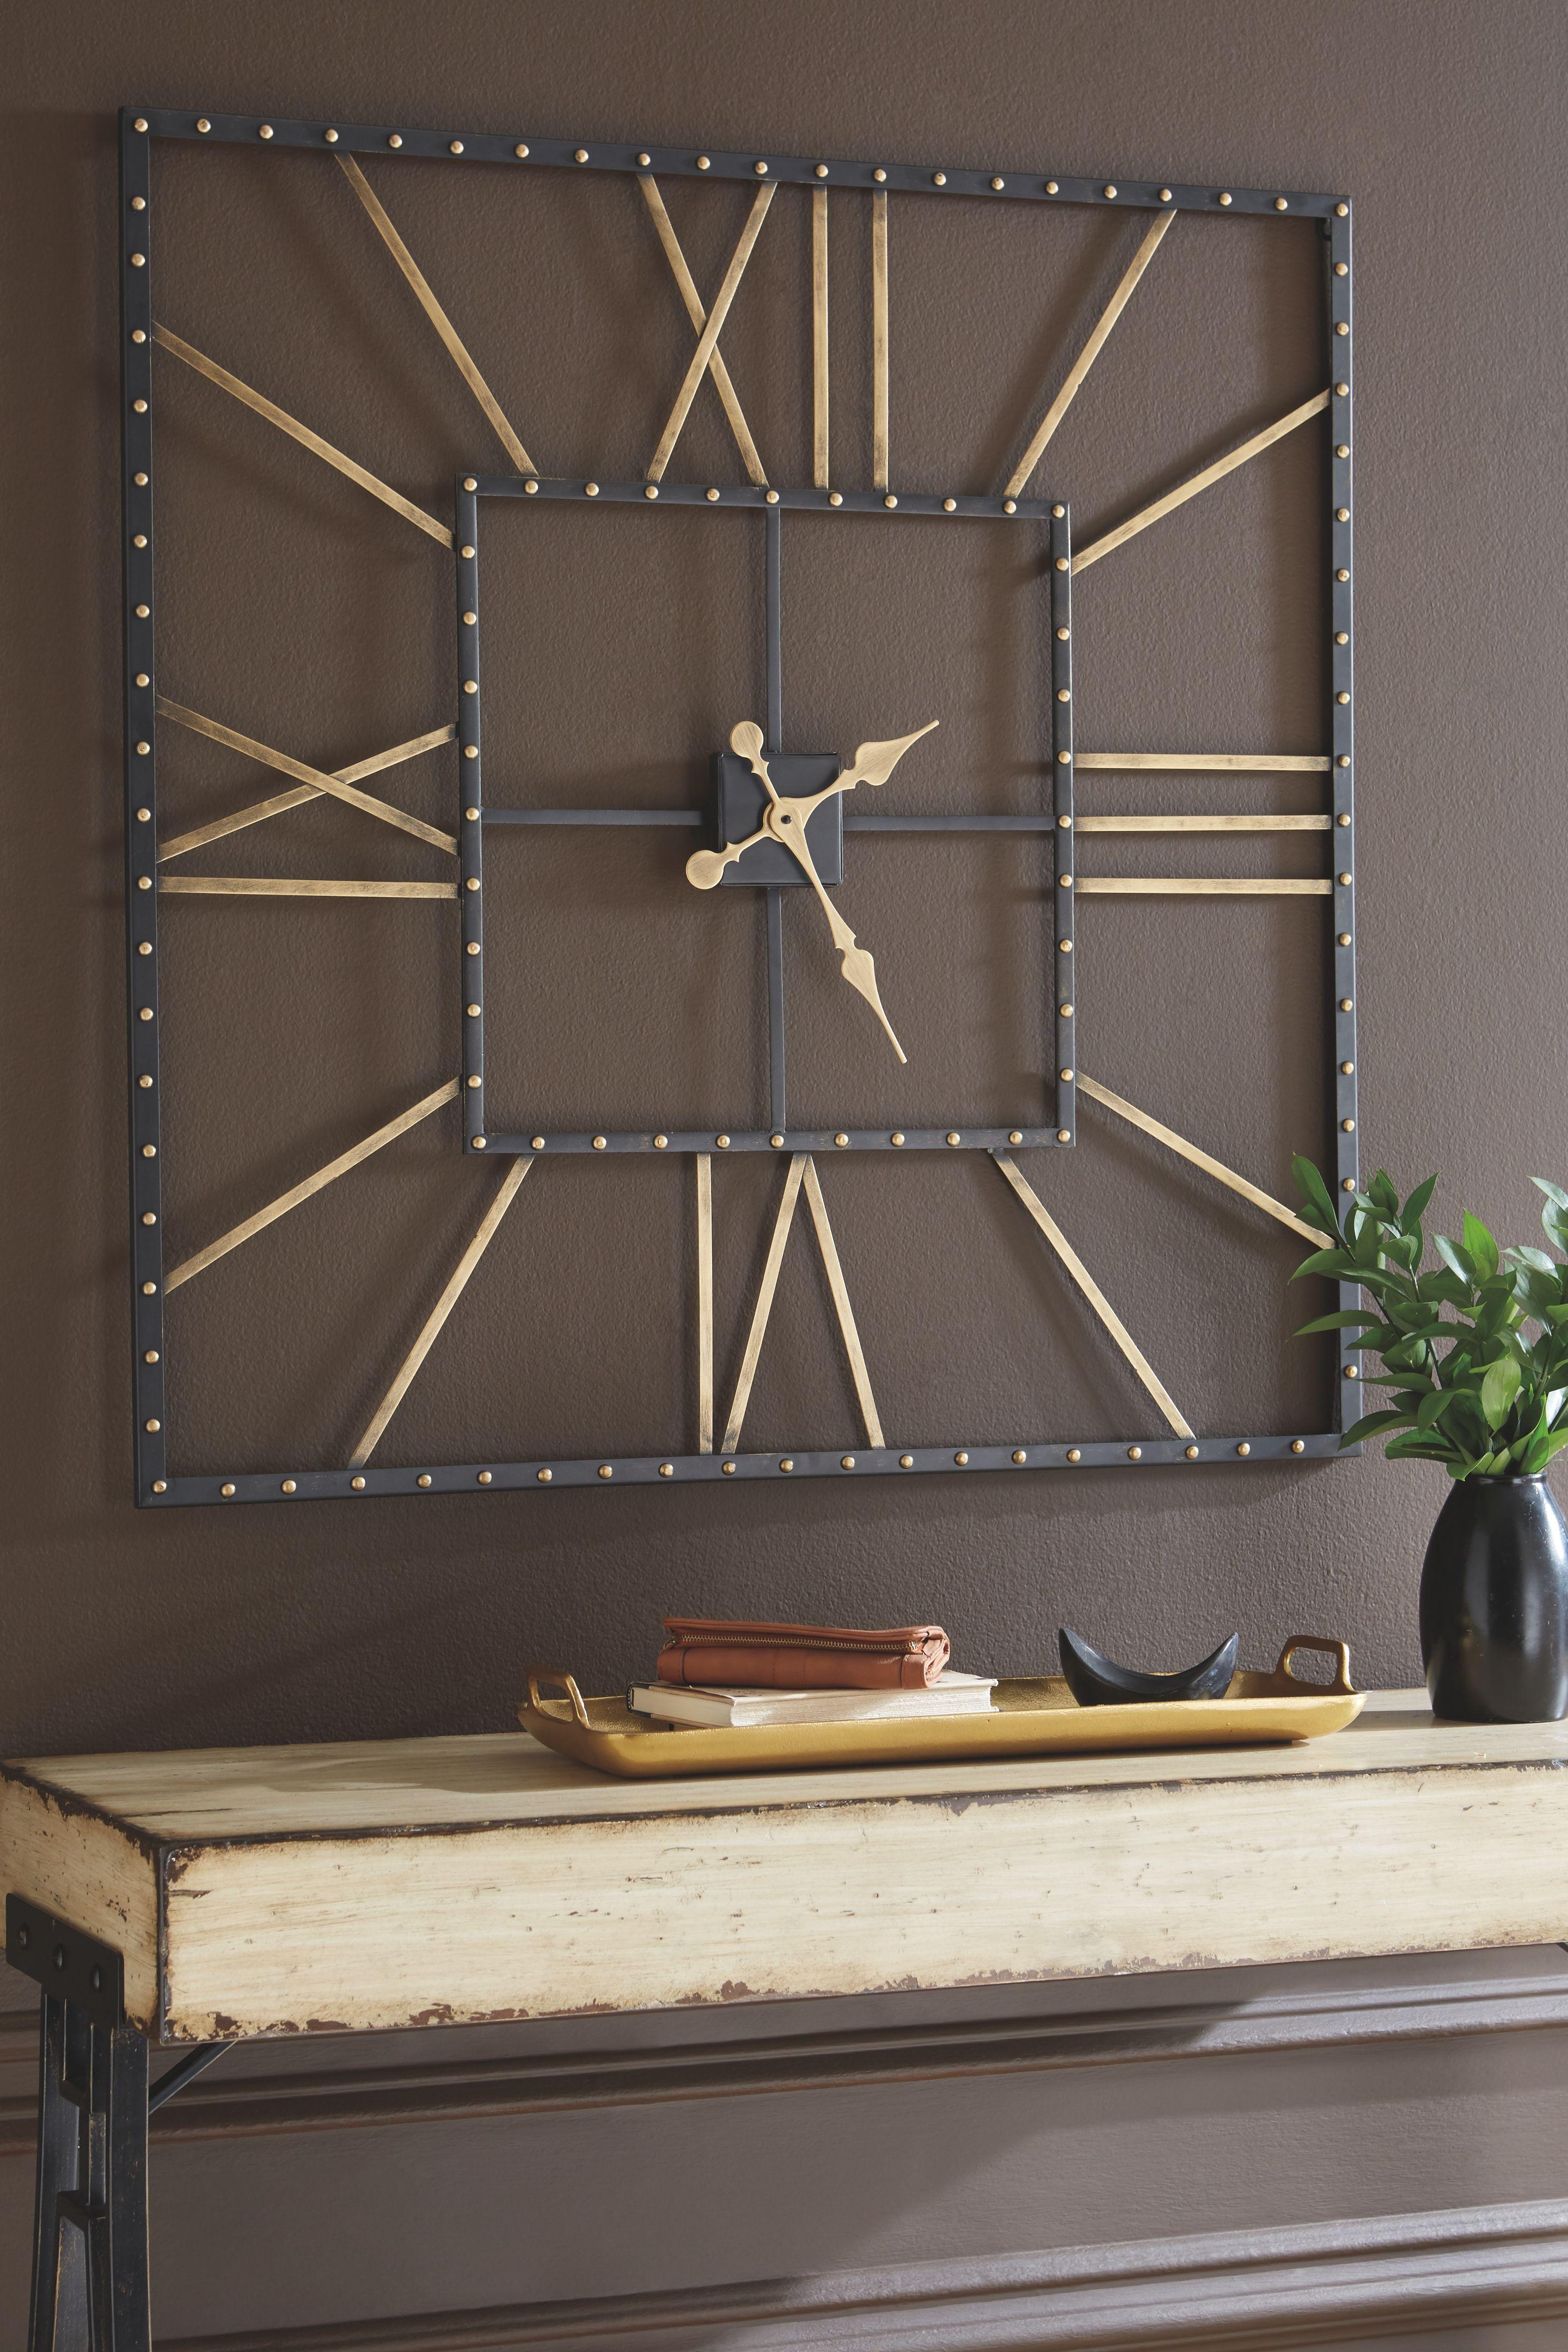 Thames Wall Clock Black Gold Finish Diy Clock Wall Wall Clock Design Clock Wall Decor